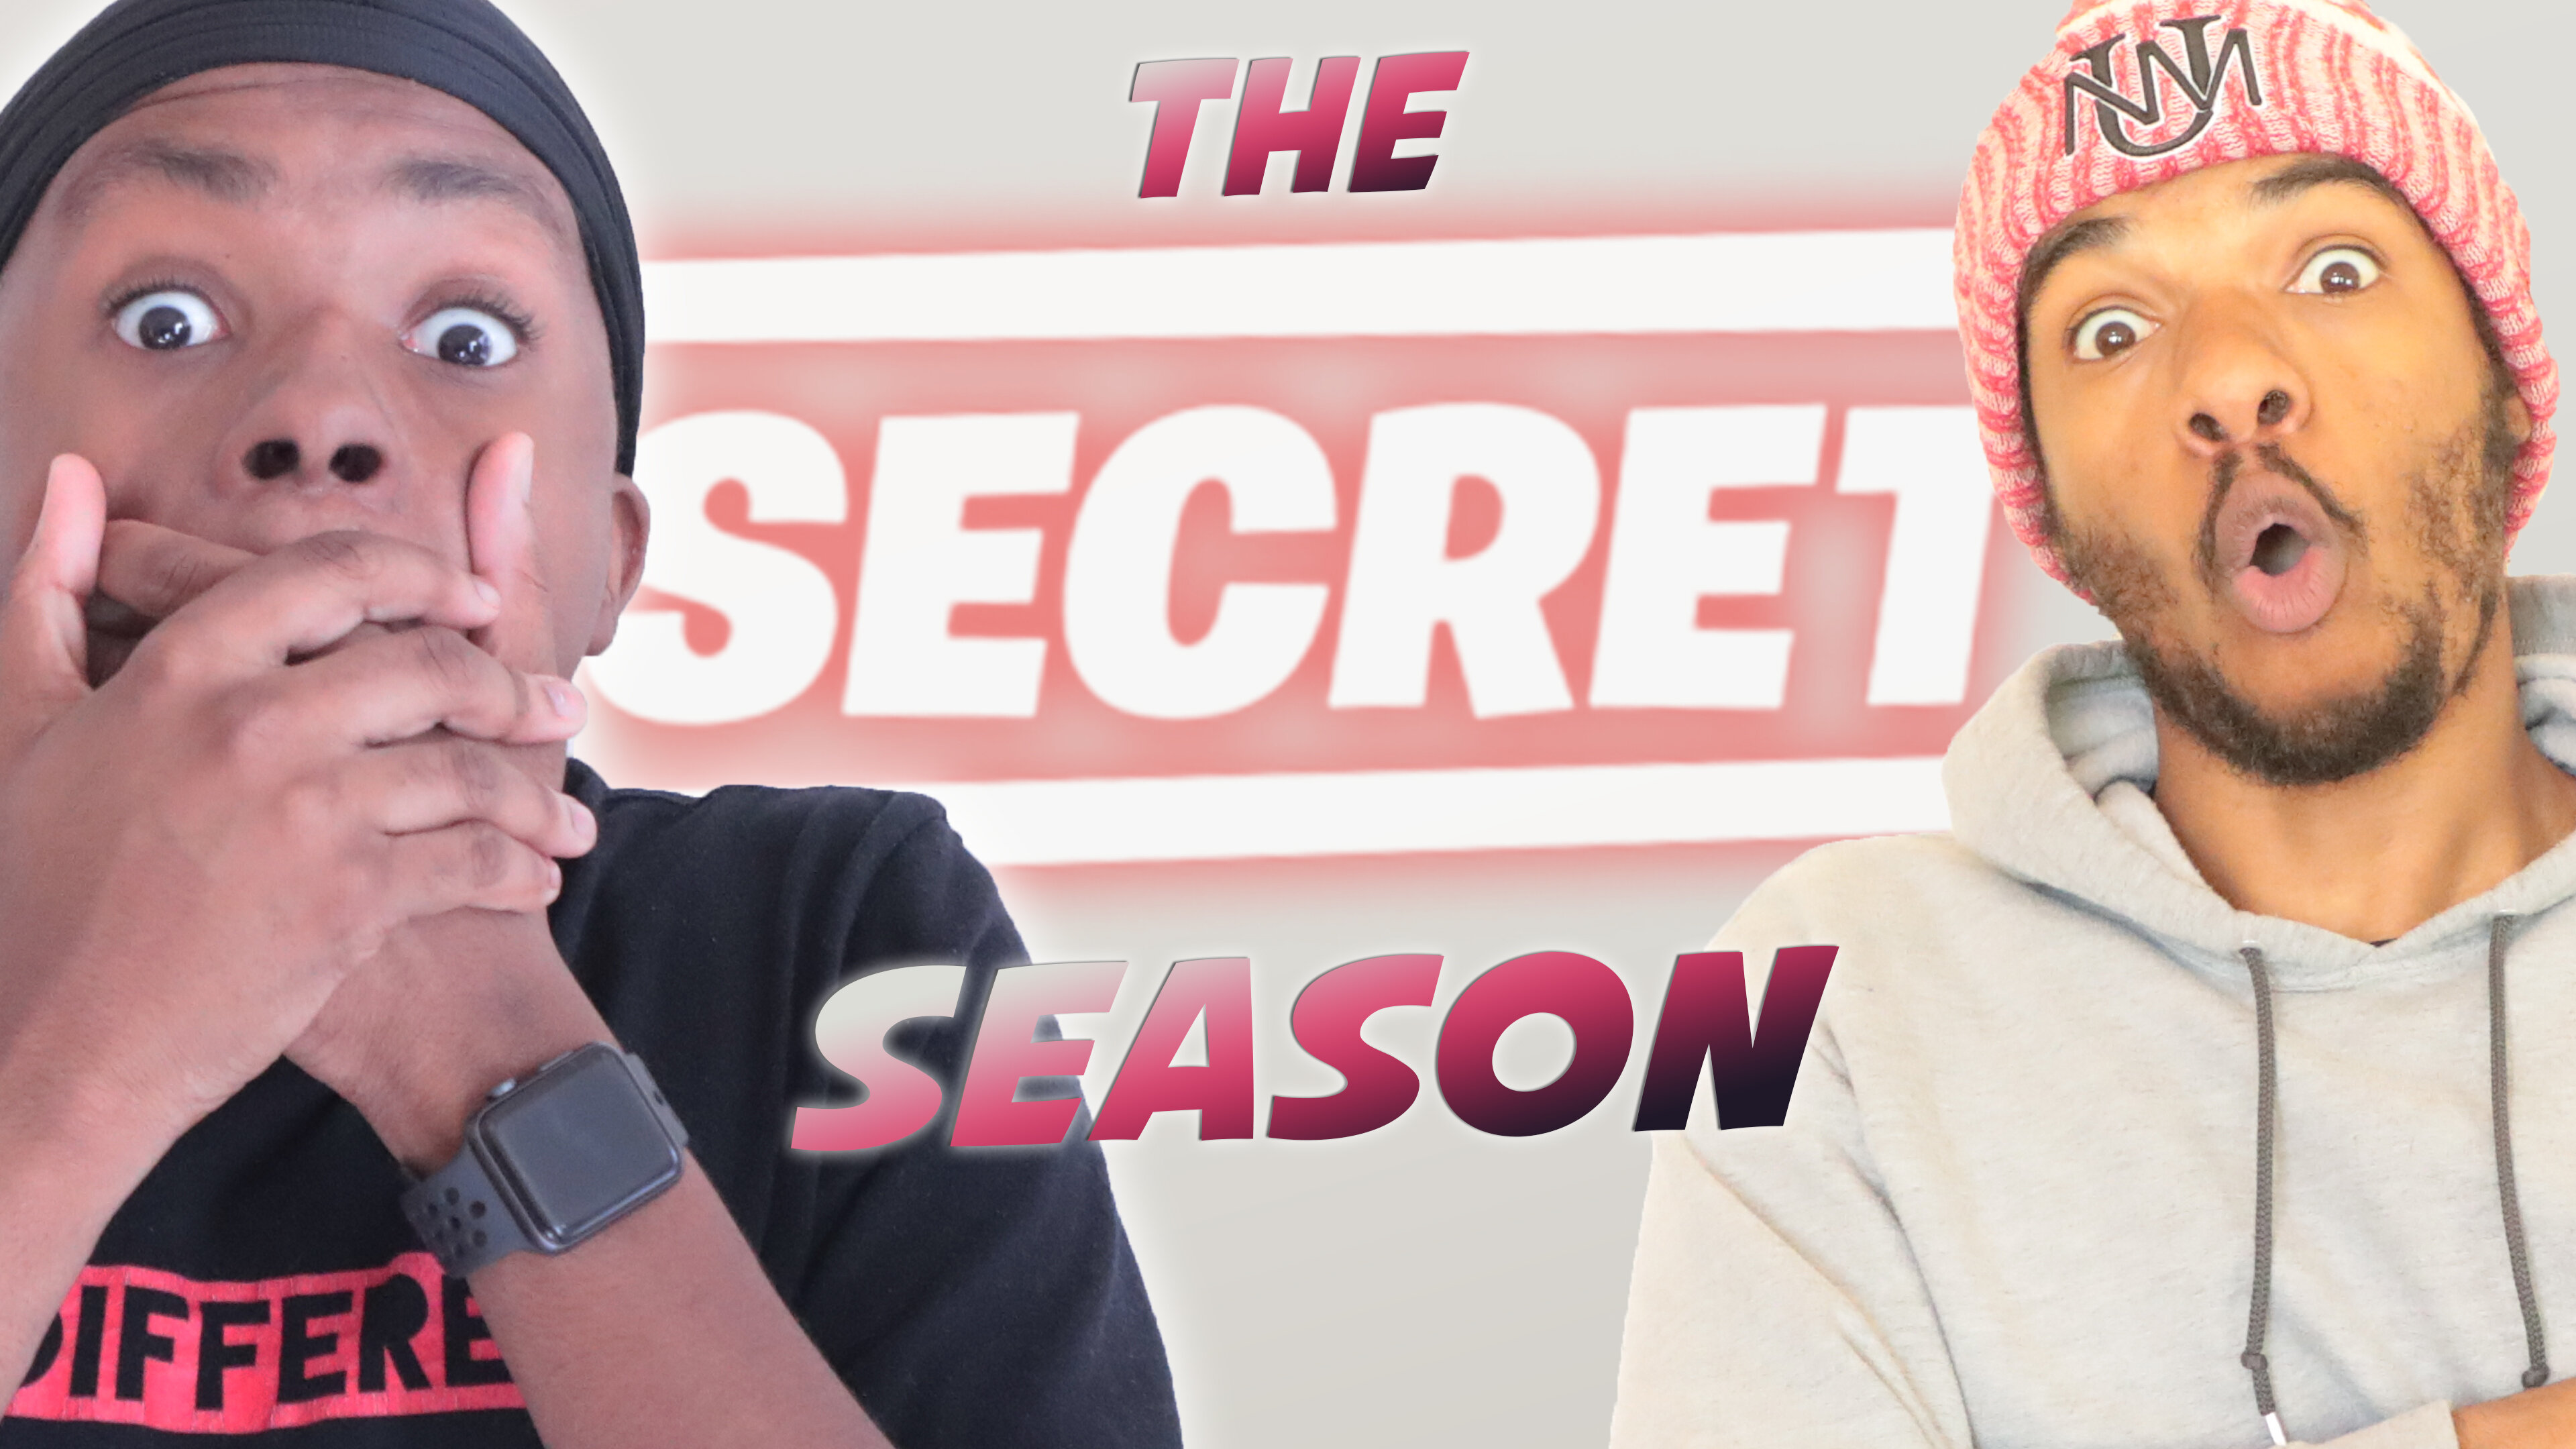 The Secret Season